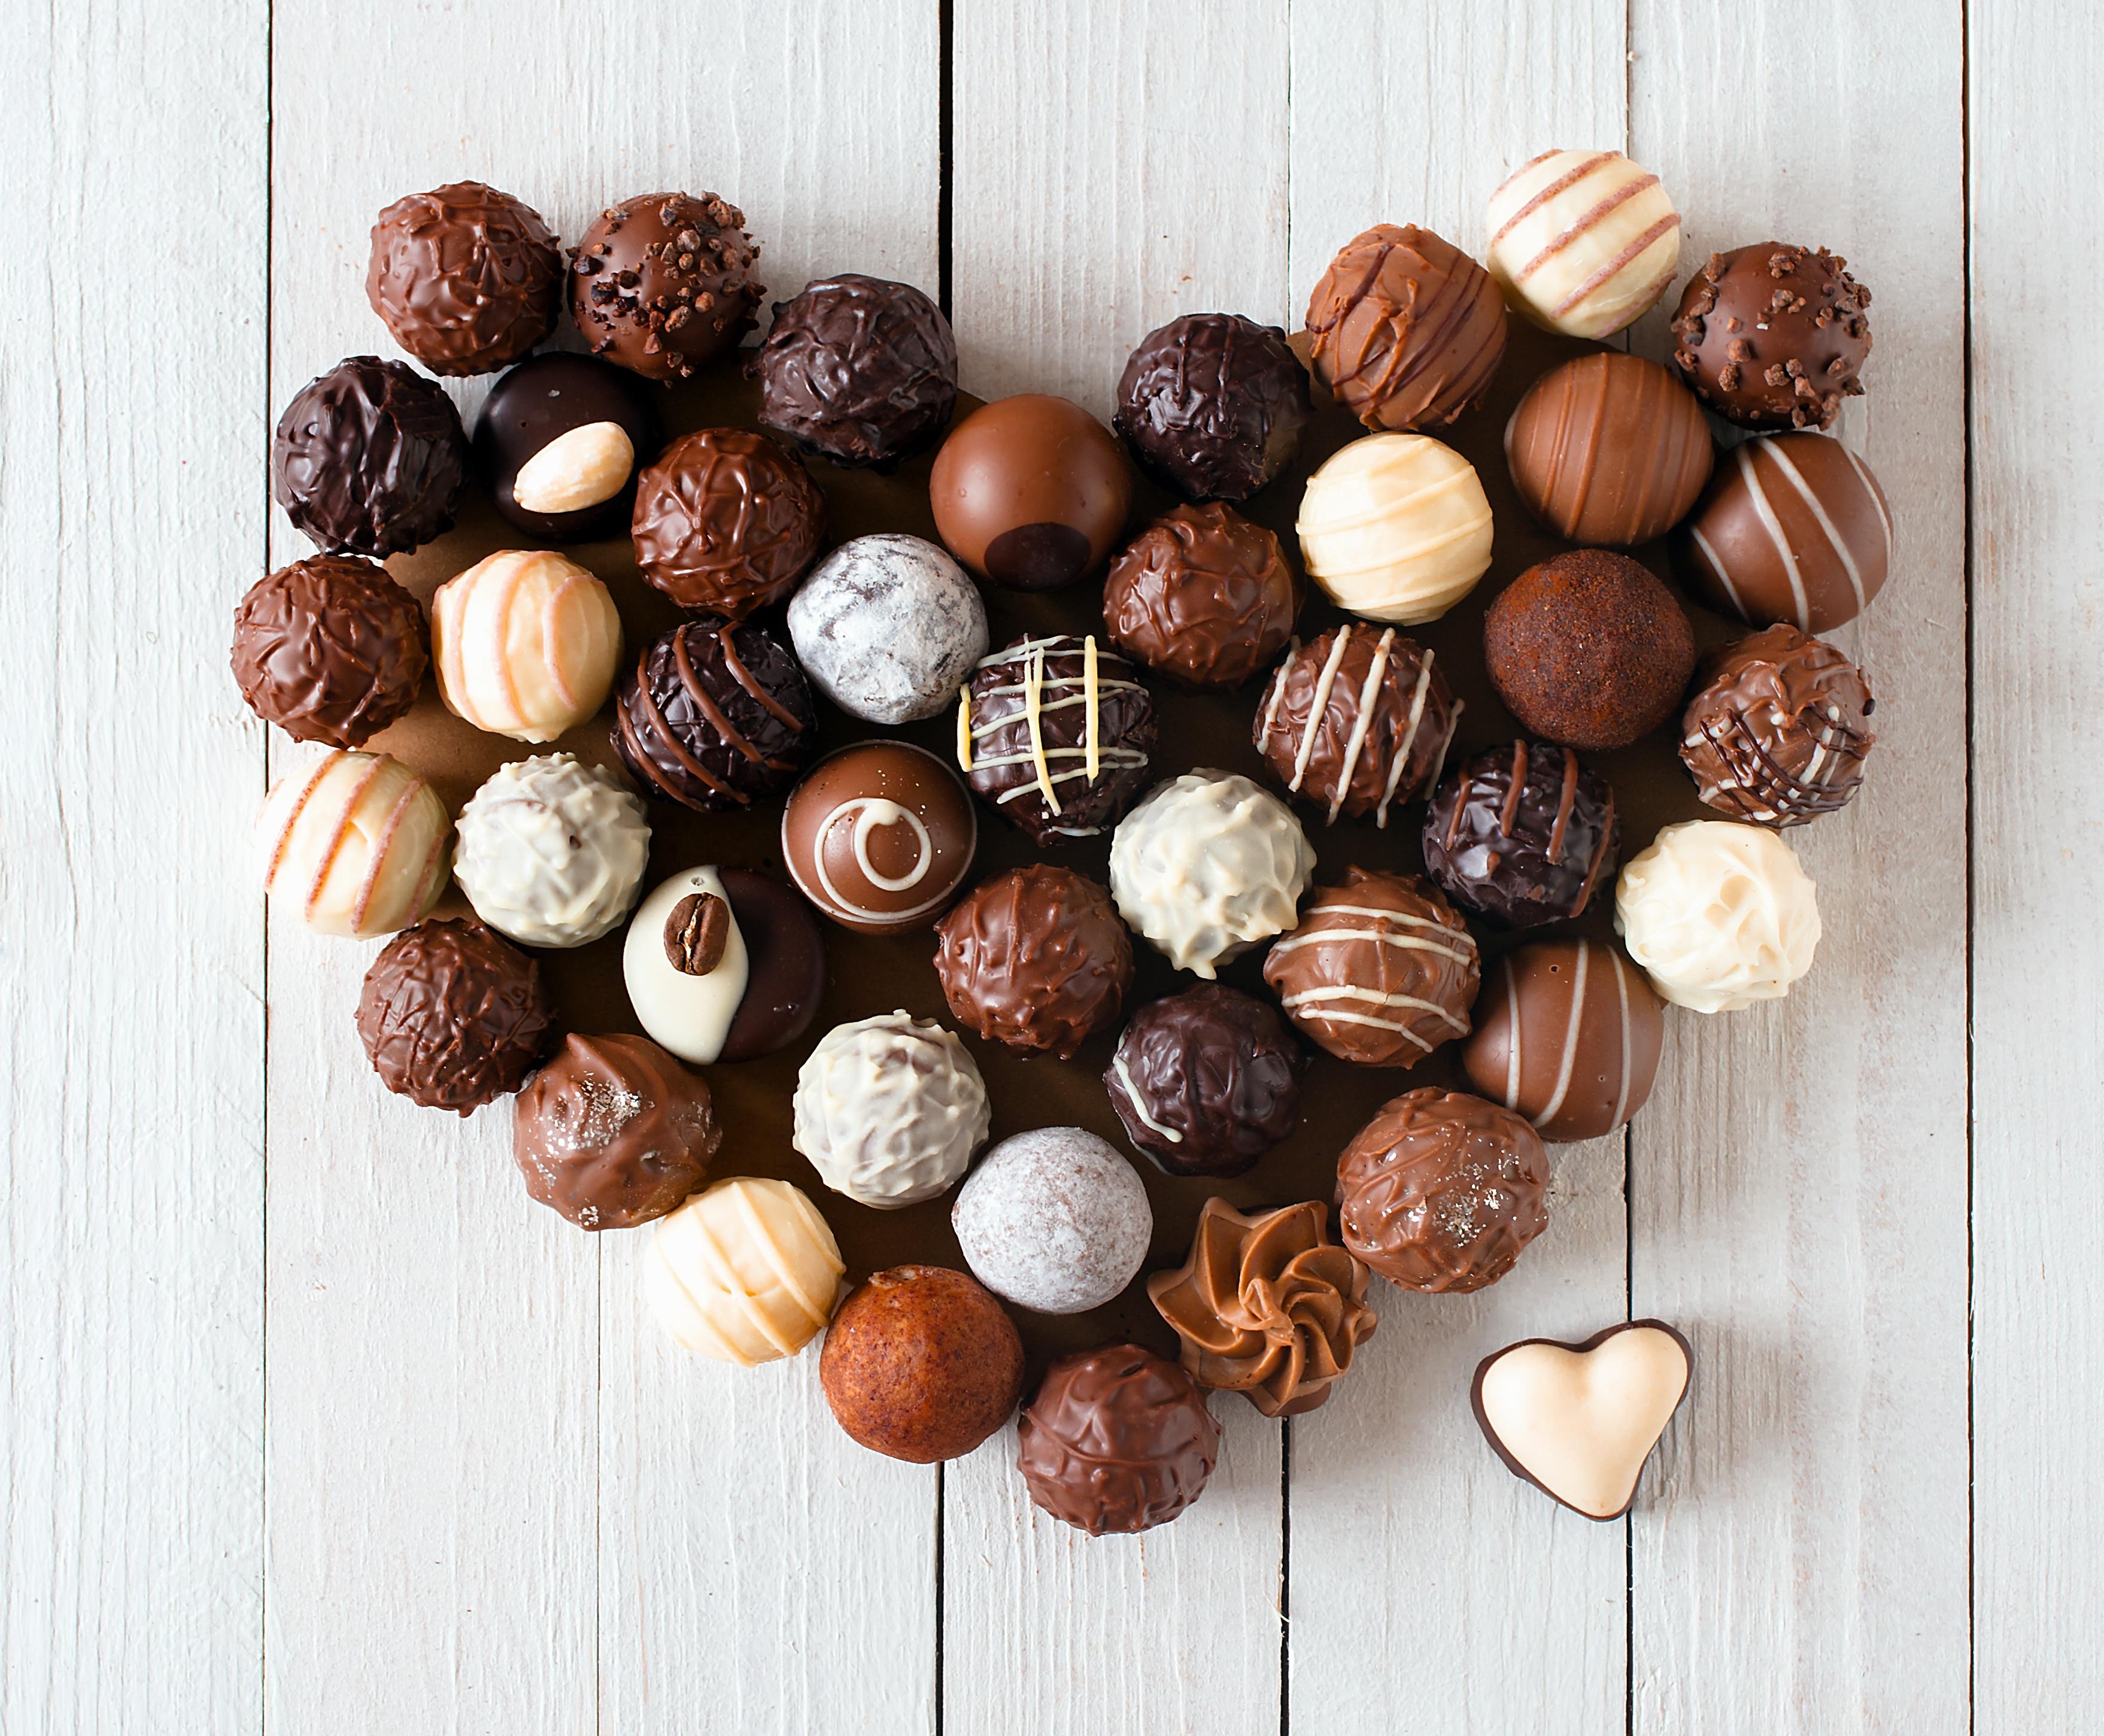 chocolates - photo #13